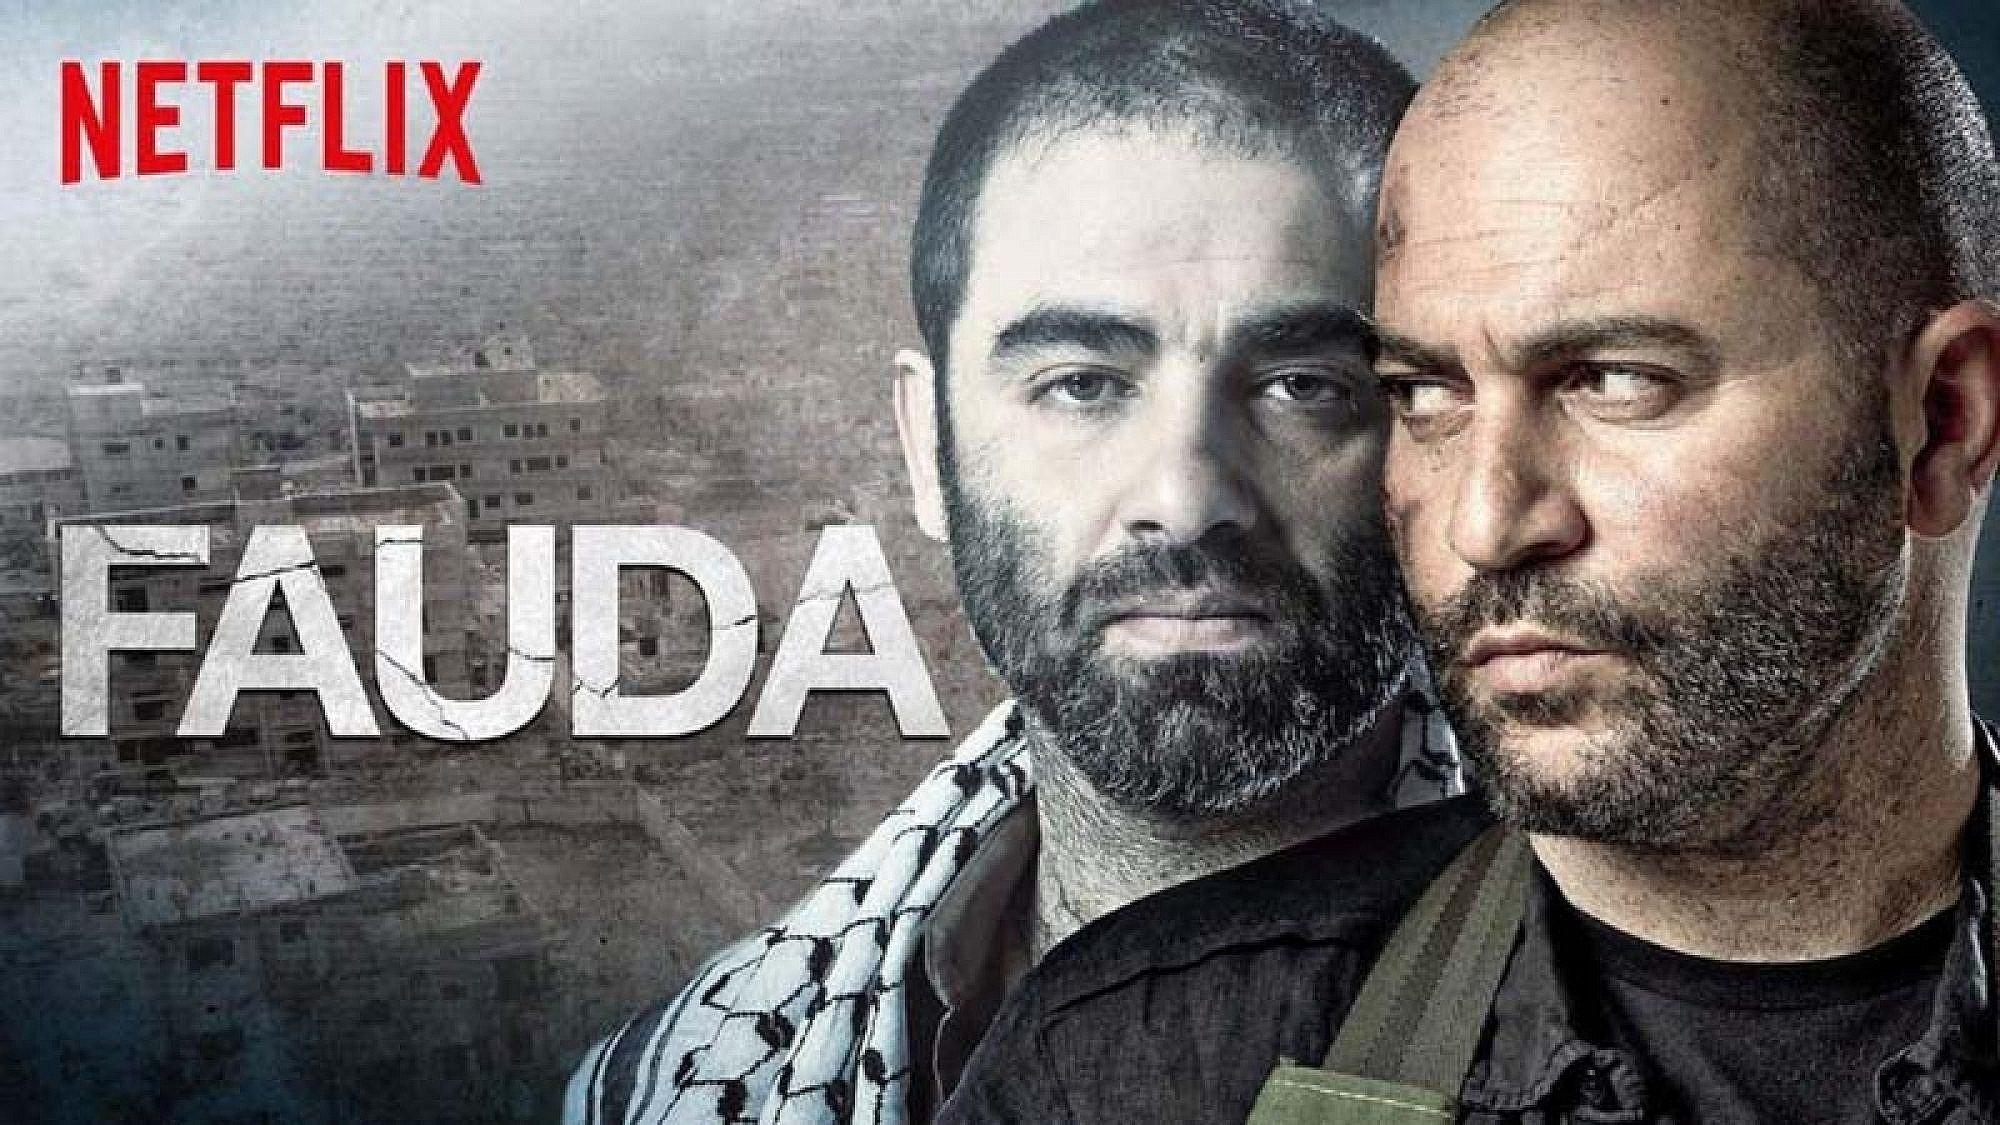 Netflix Fauda Season 4 Release Date, Plot, Cast and Trailer Details